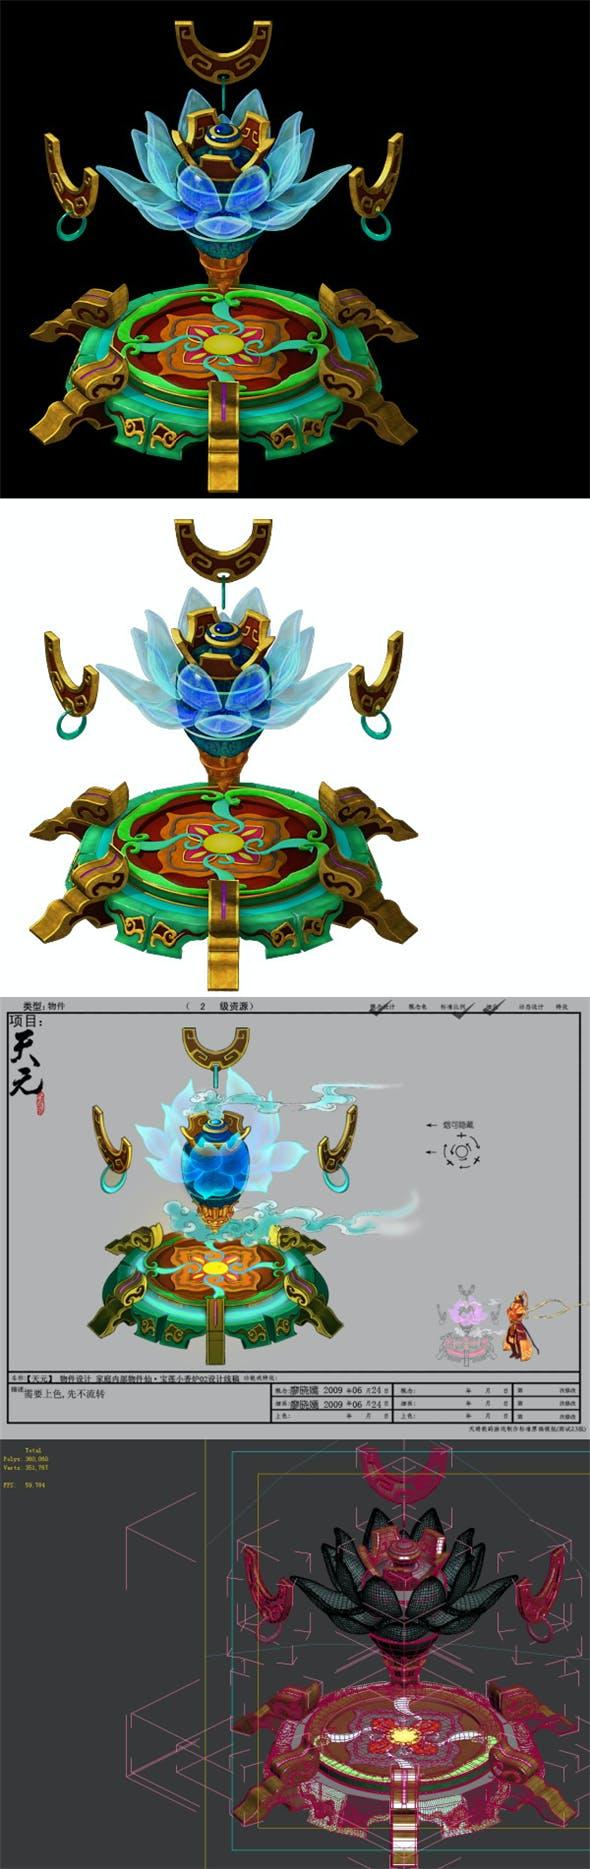 Game Model - Family Objects - Lotus Censer 02 - 3DOcean Item for Sale